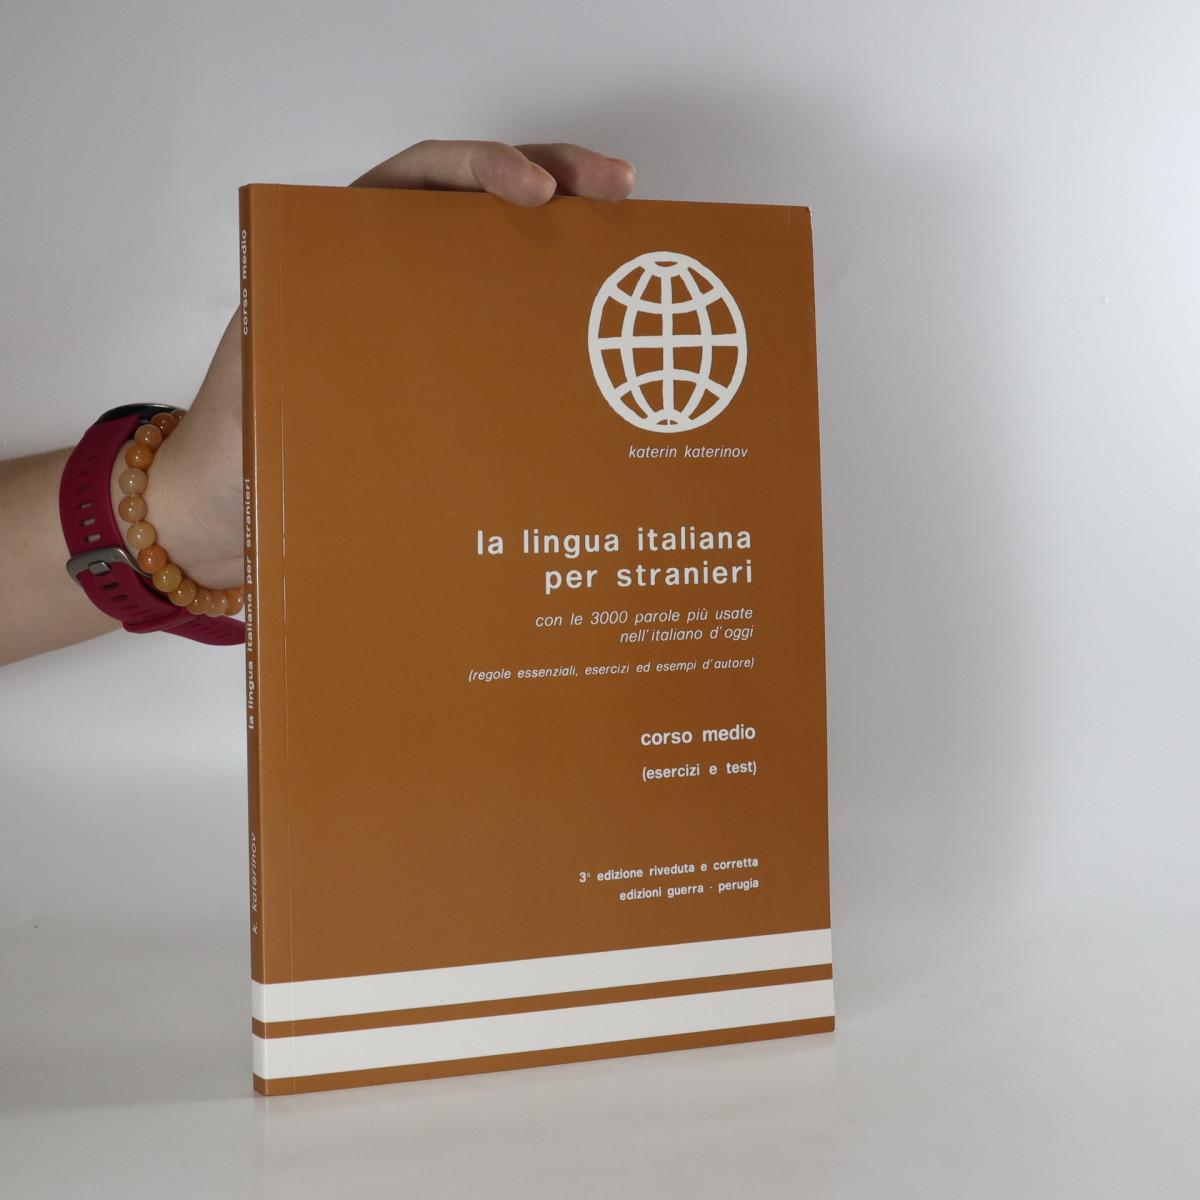 antikvární kniha La lingua italiana per stranieri : corso medio, neuveden